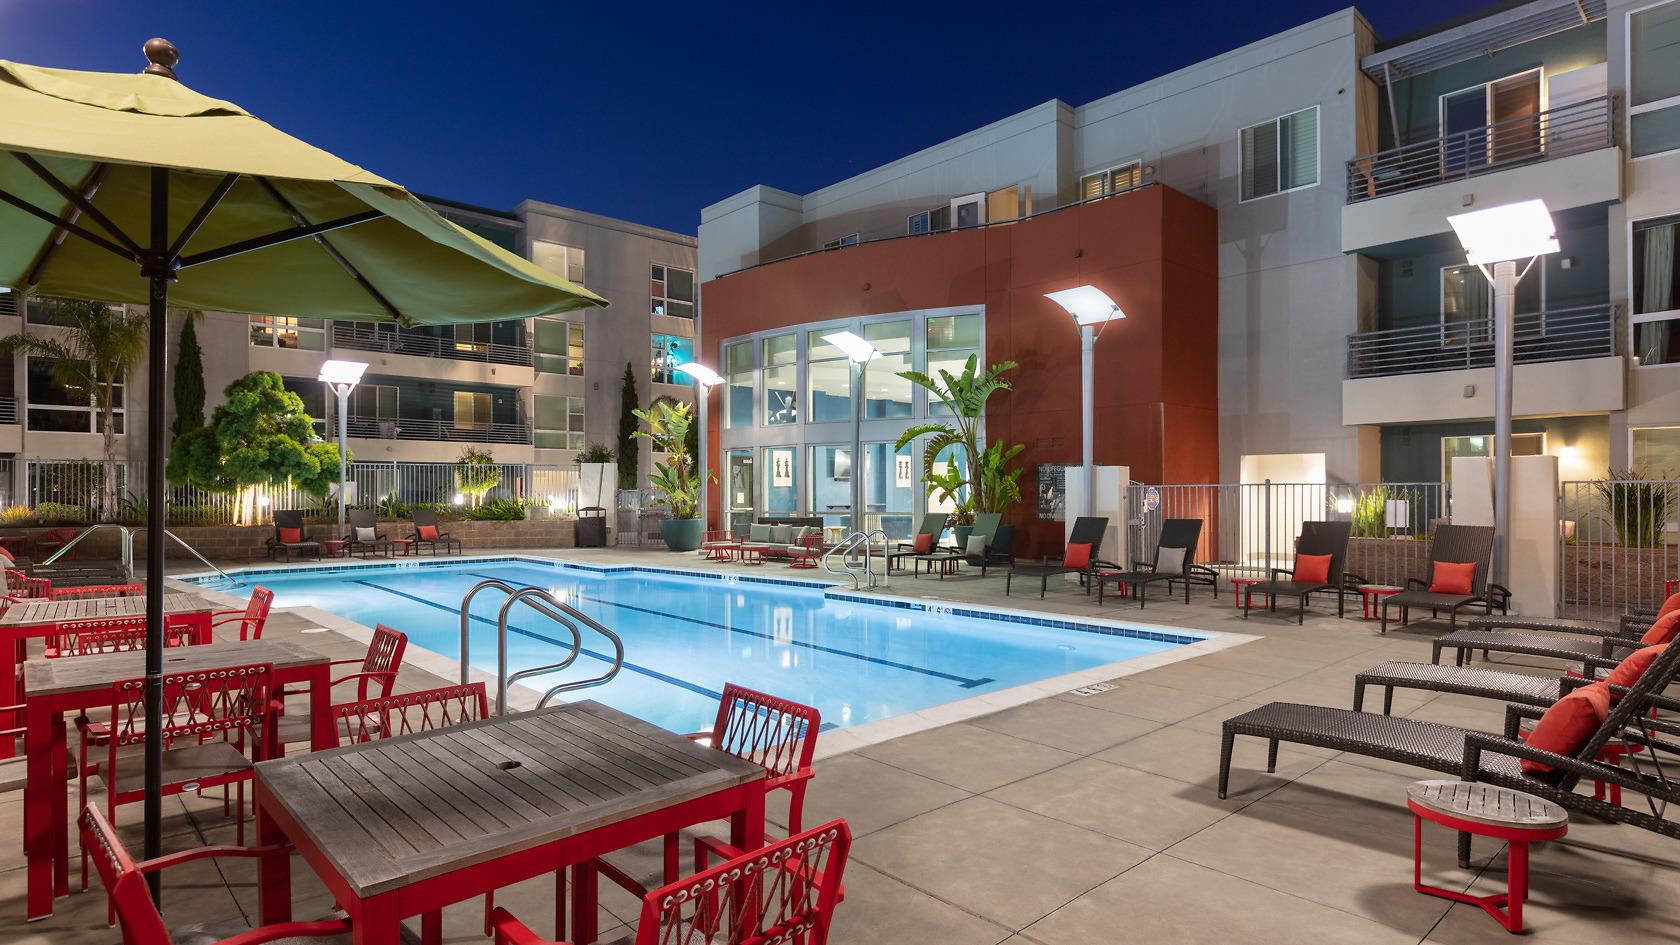 Avenue 64 Short Term Housing-Sample Image of Emeryville CA Nurse Rental